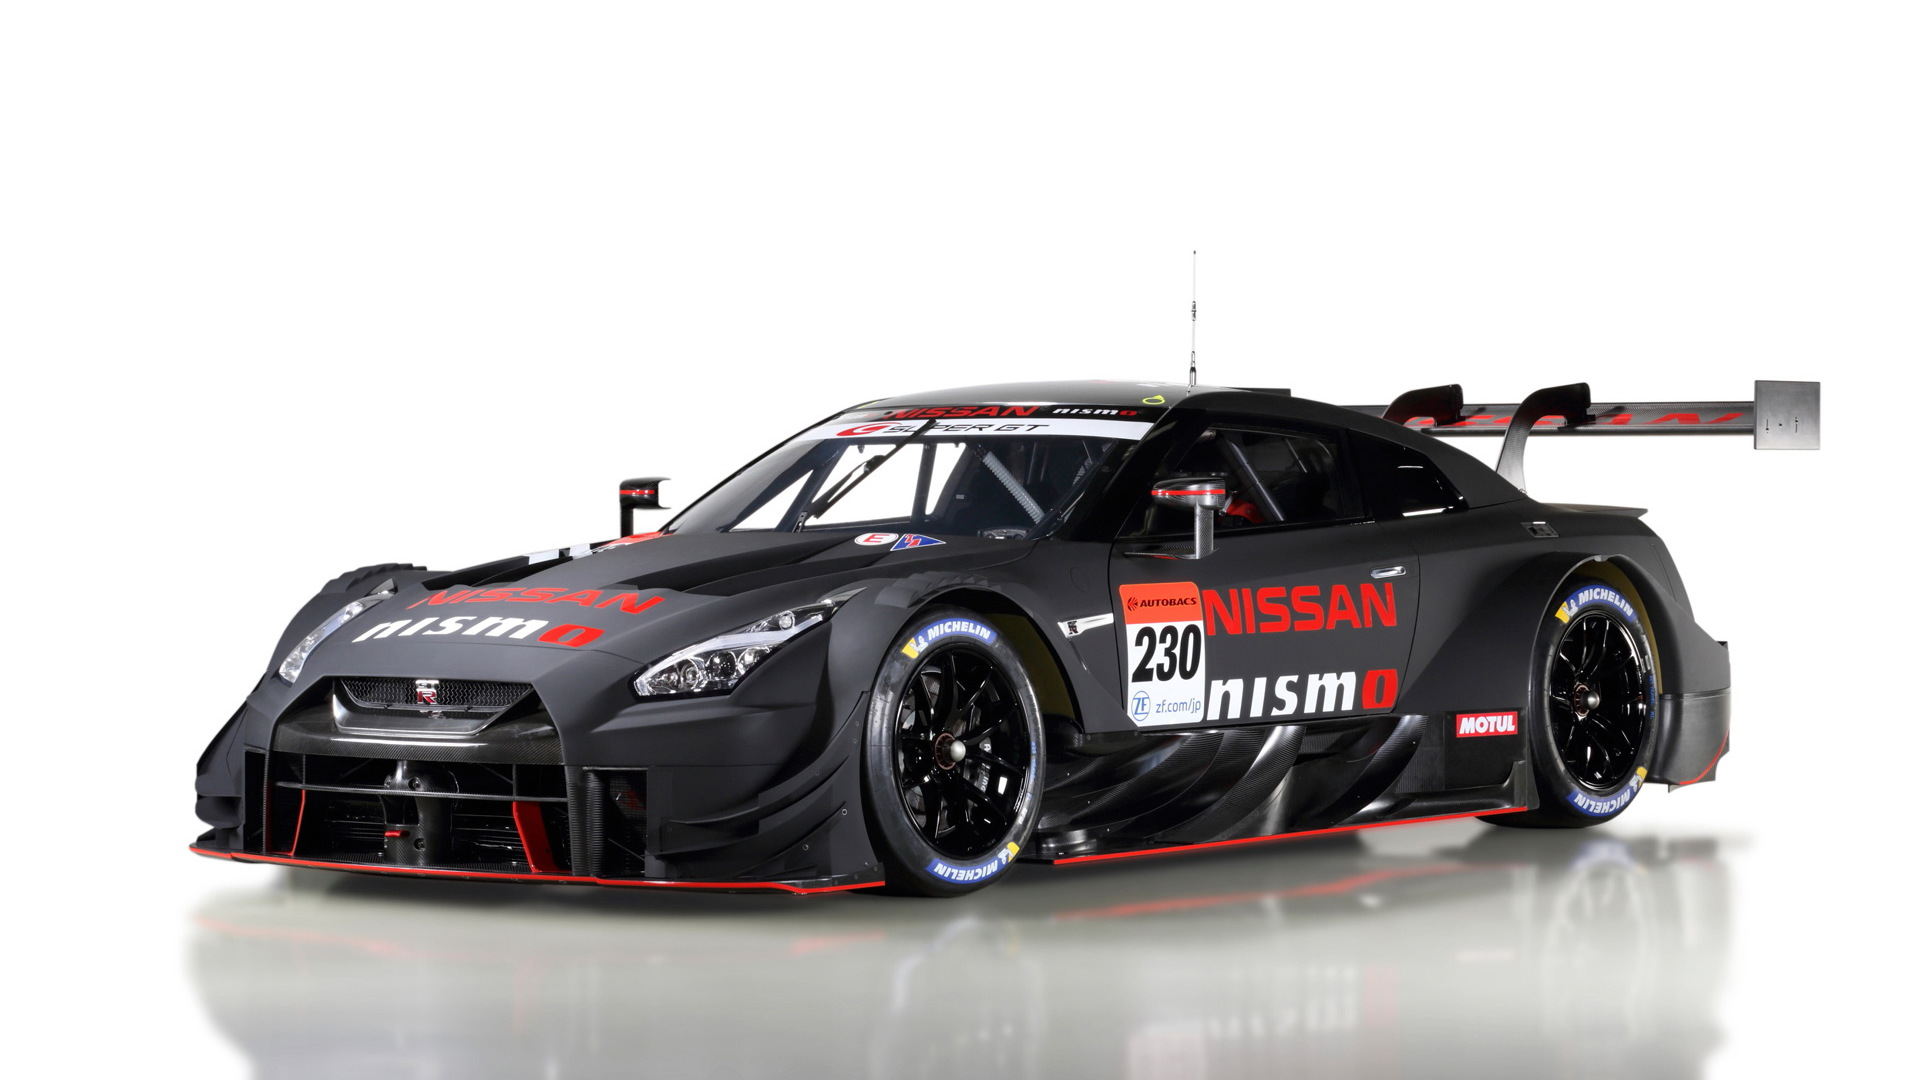 2020 Nissan GT-R Nismo GT500 Super GT race car